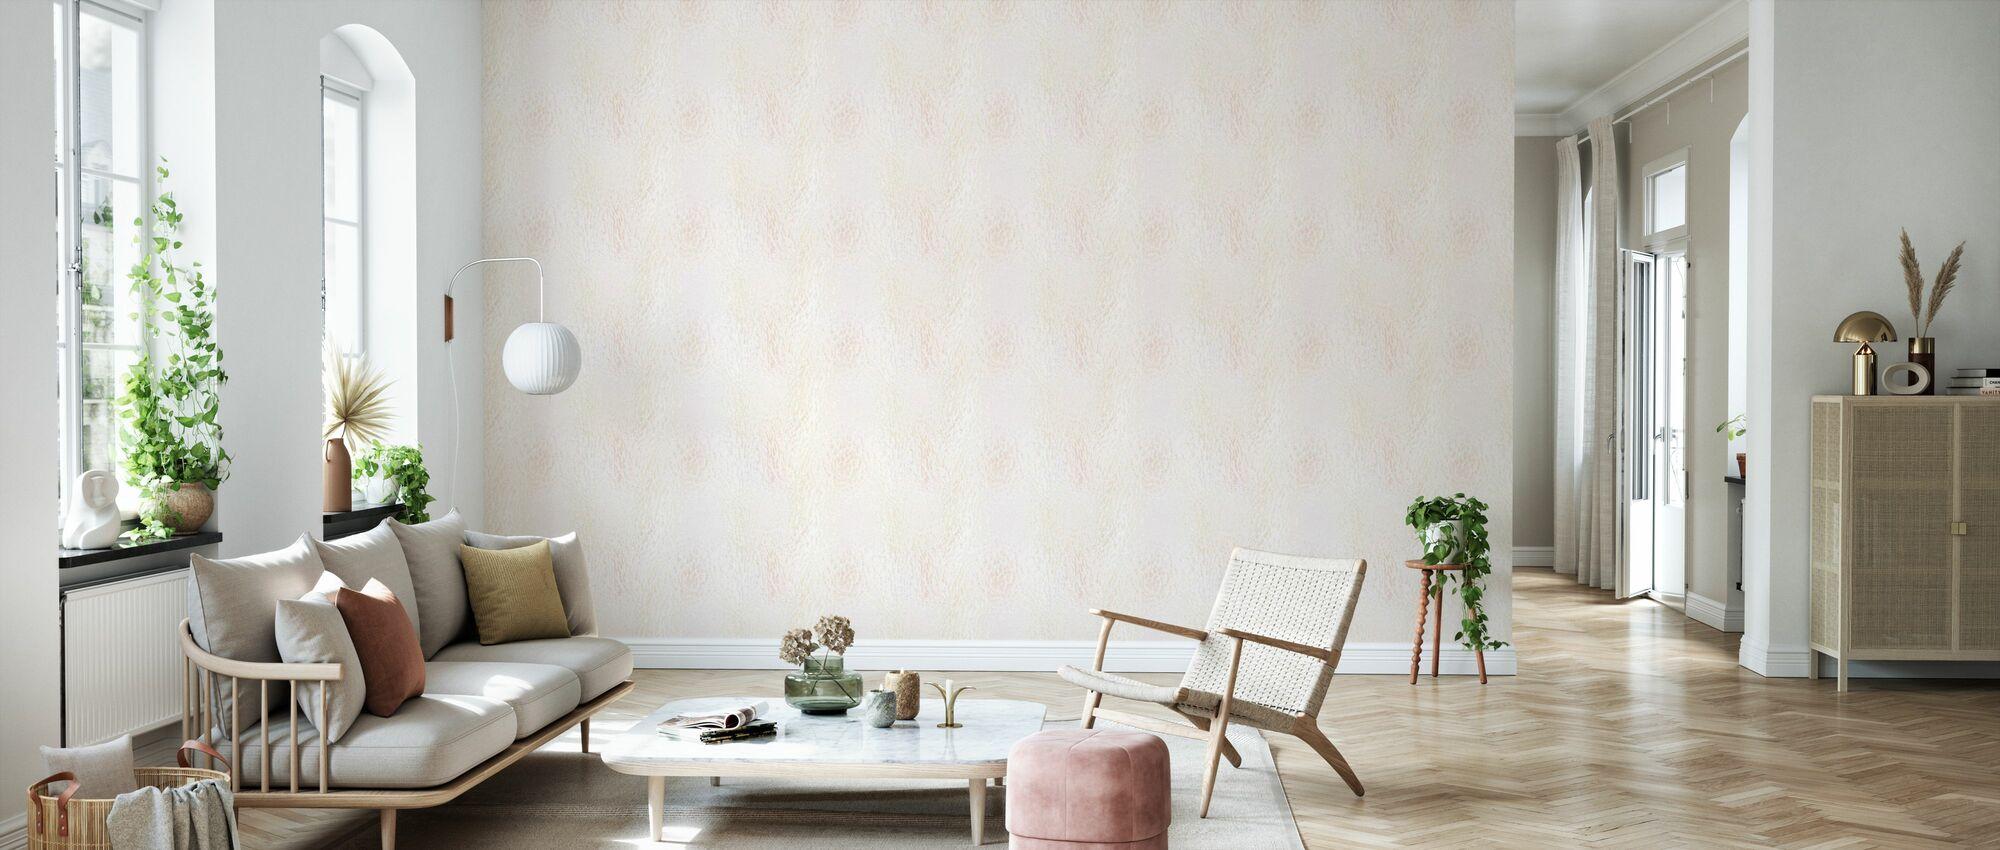 Corail Blanc II - Papier peint - Salle à manger